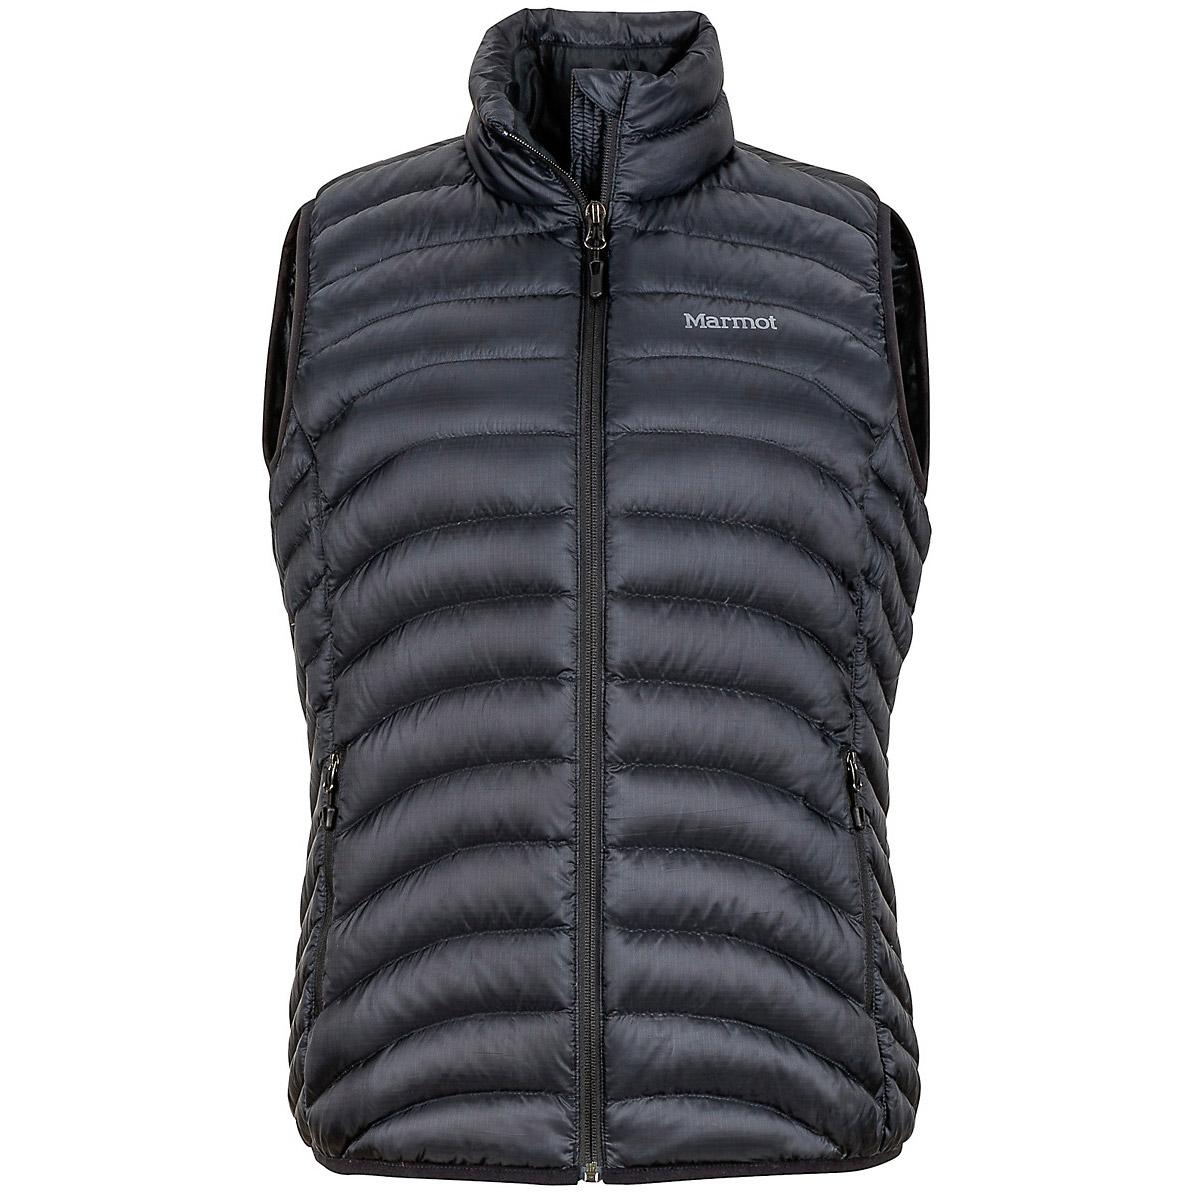 Marmot Women's Aruna Vest - Black, S